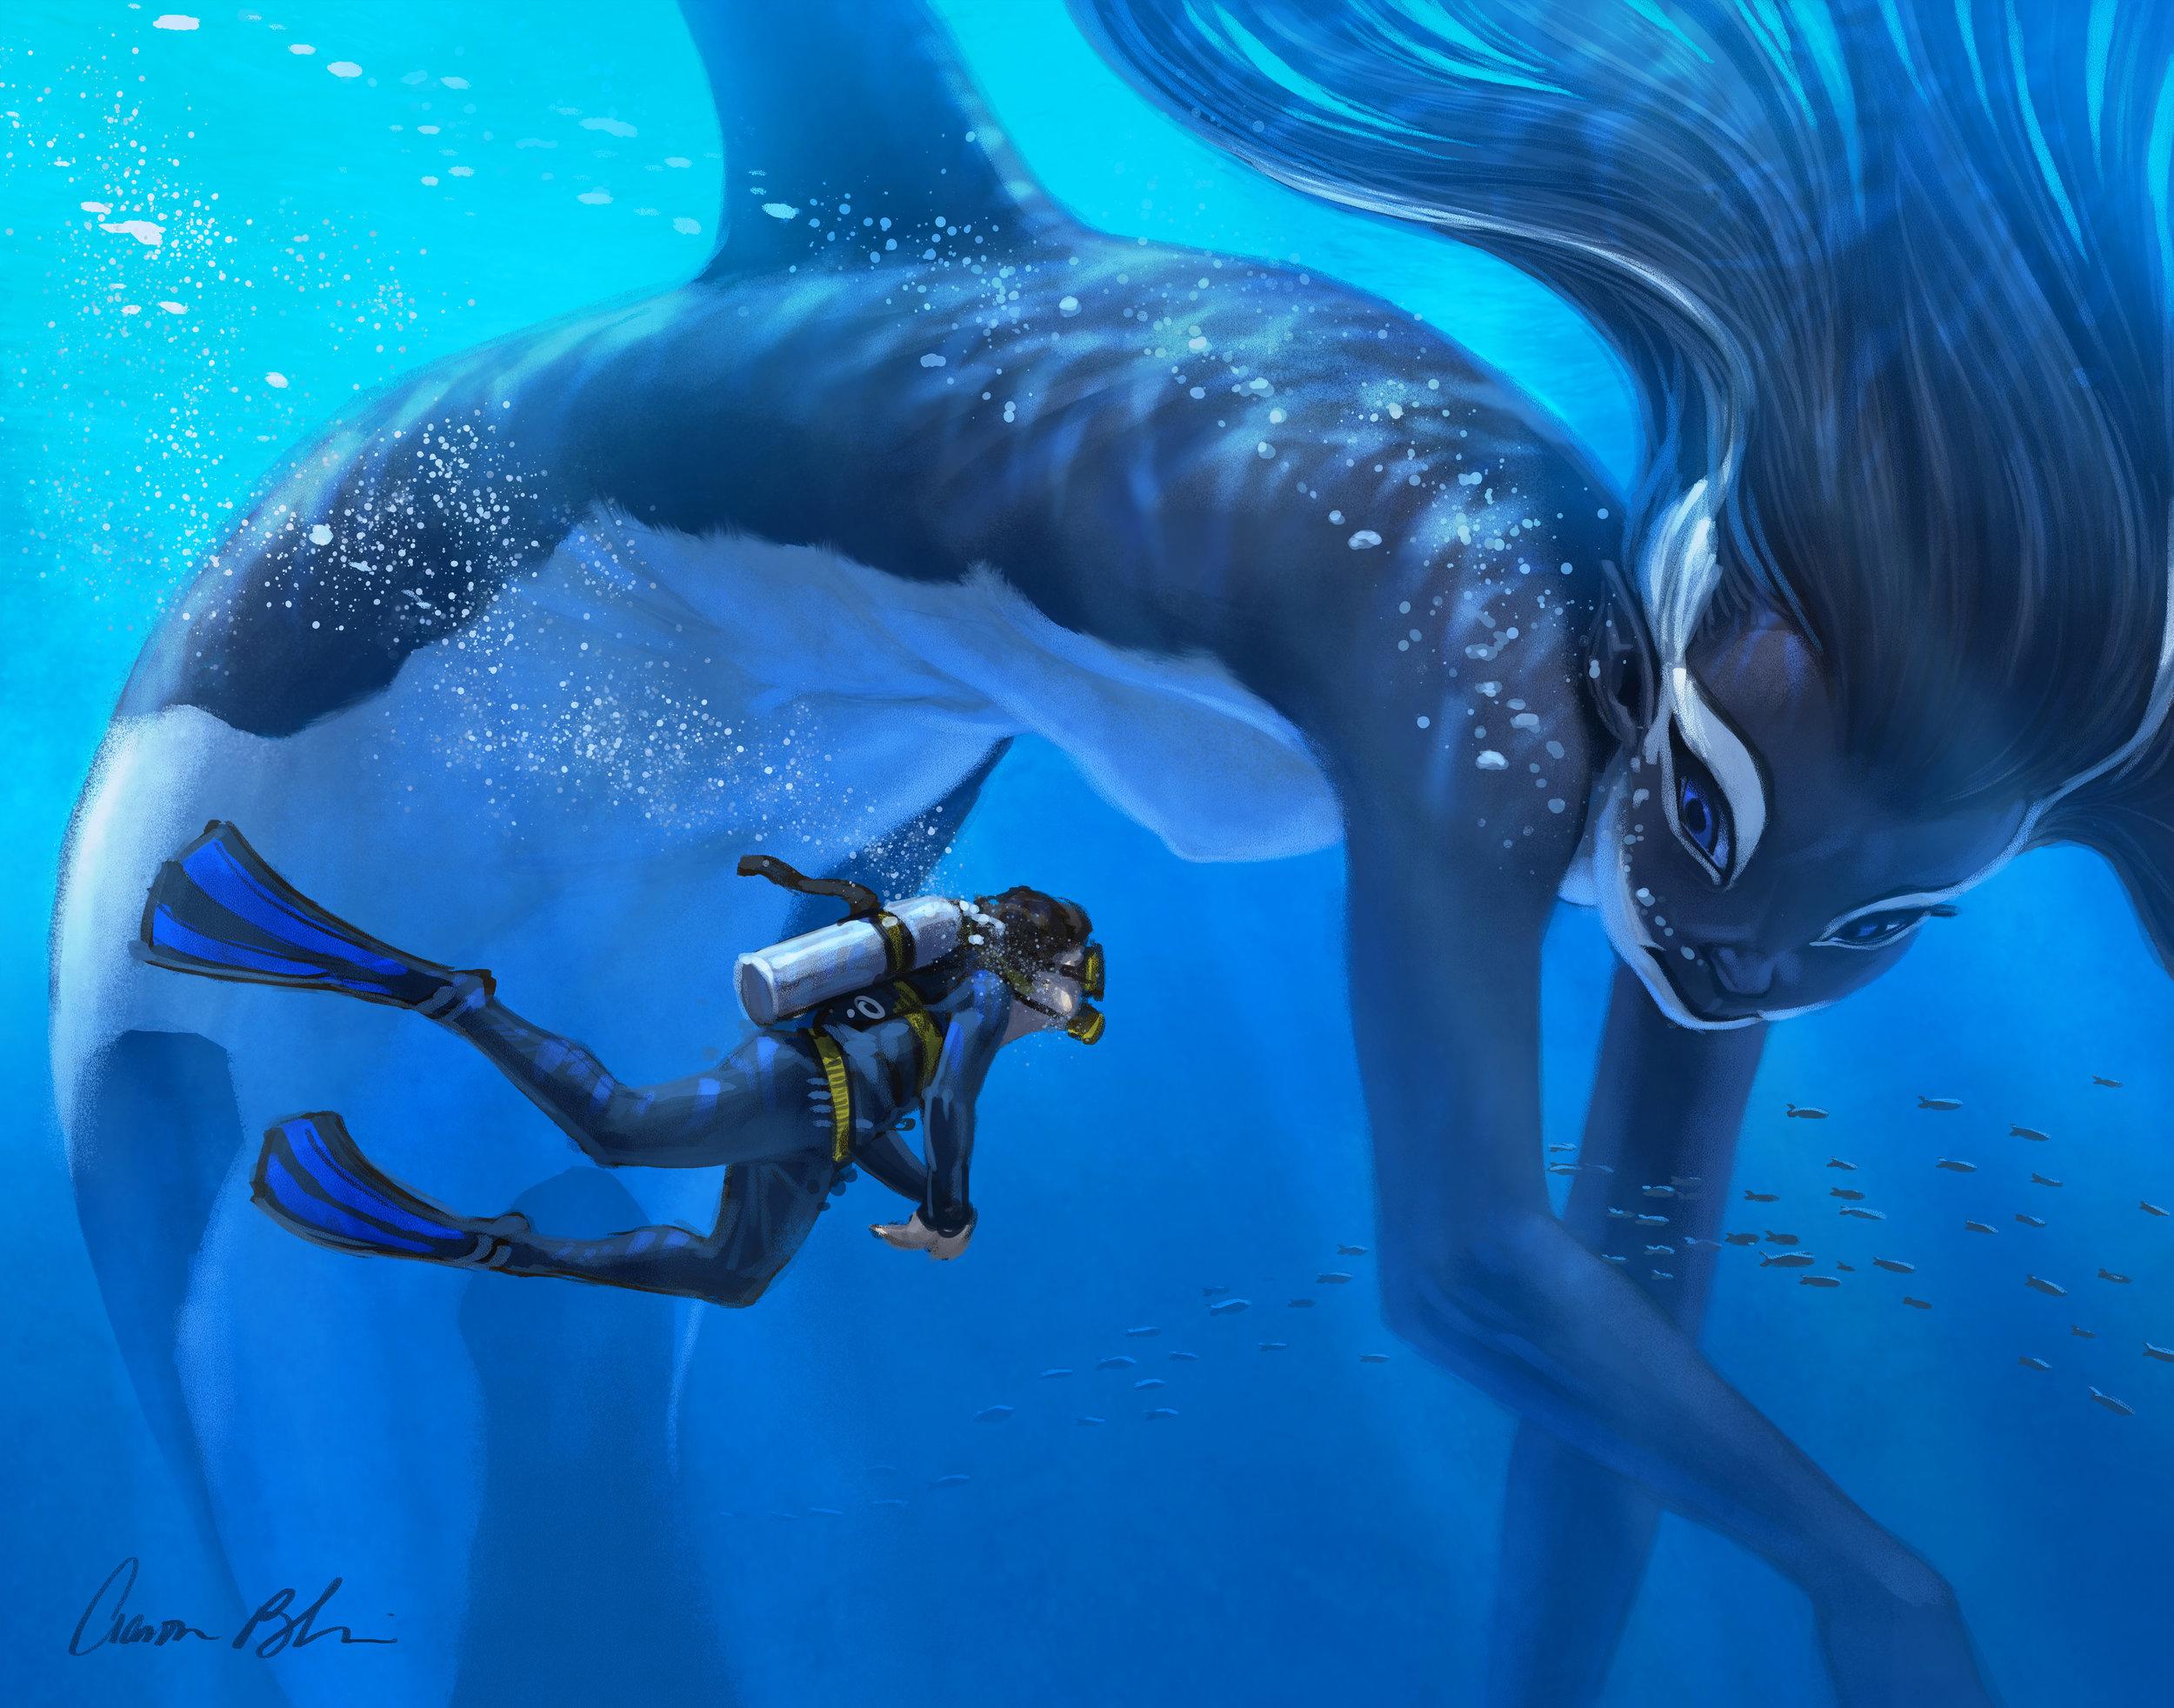 Merwhale 11x14.jpg